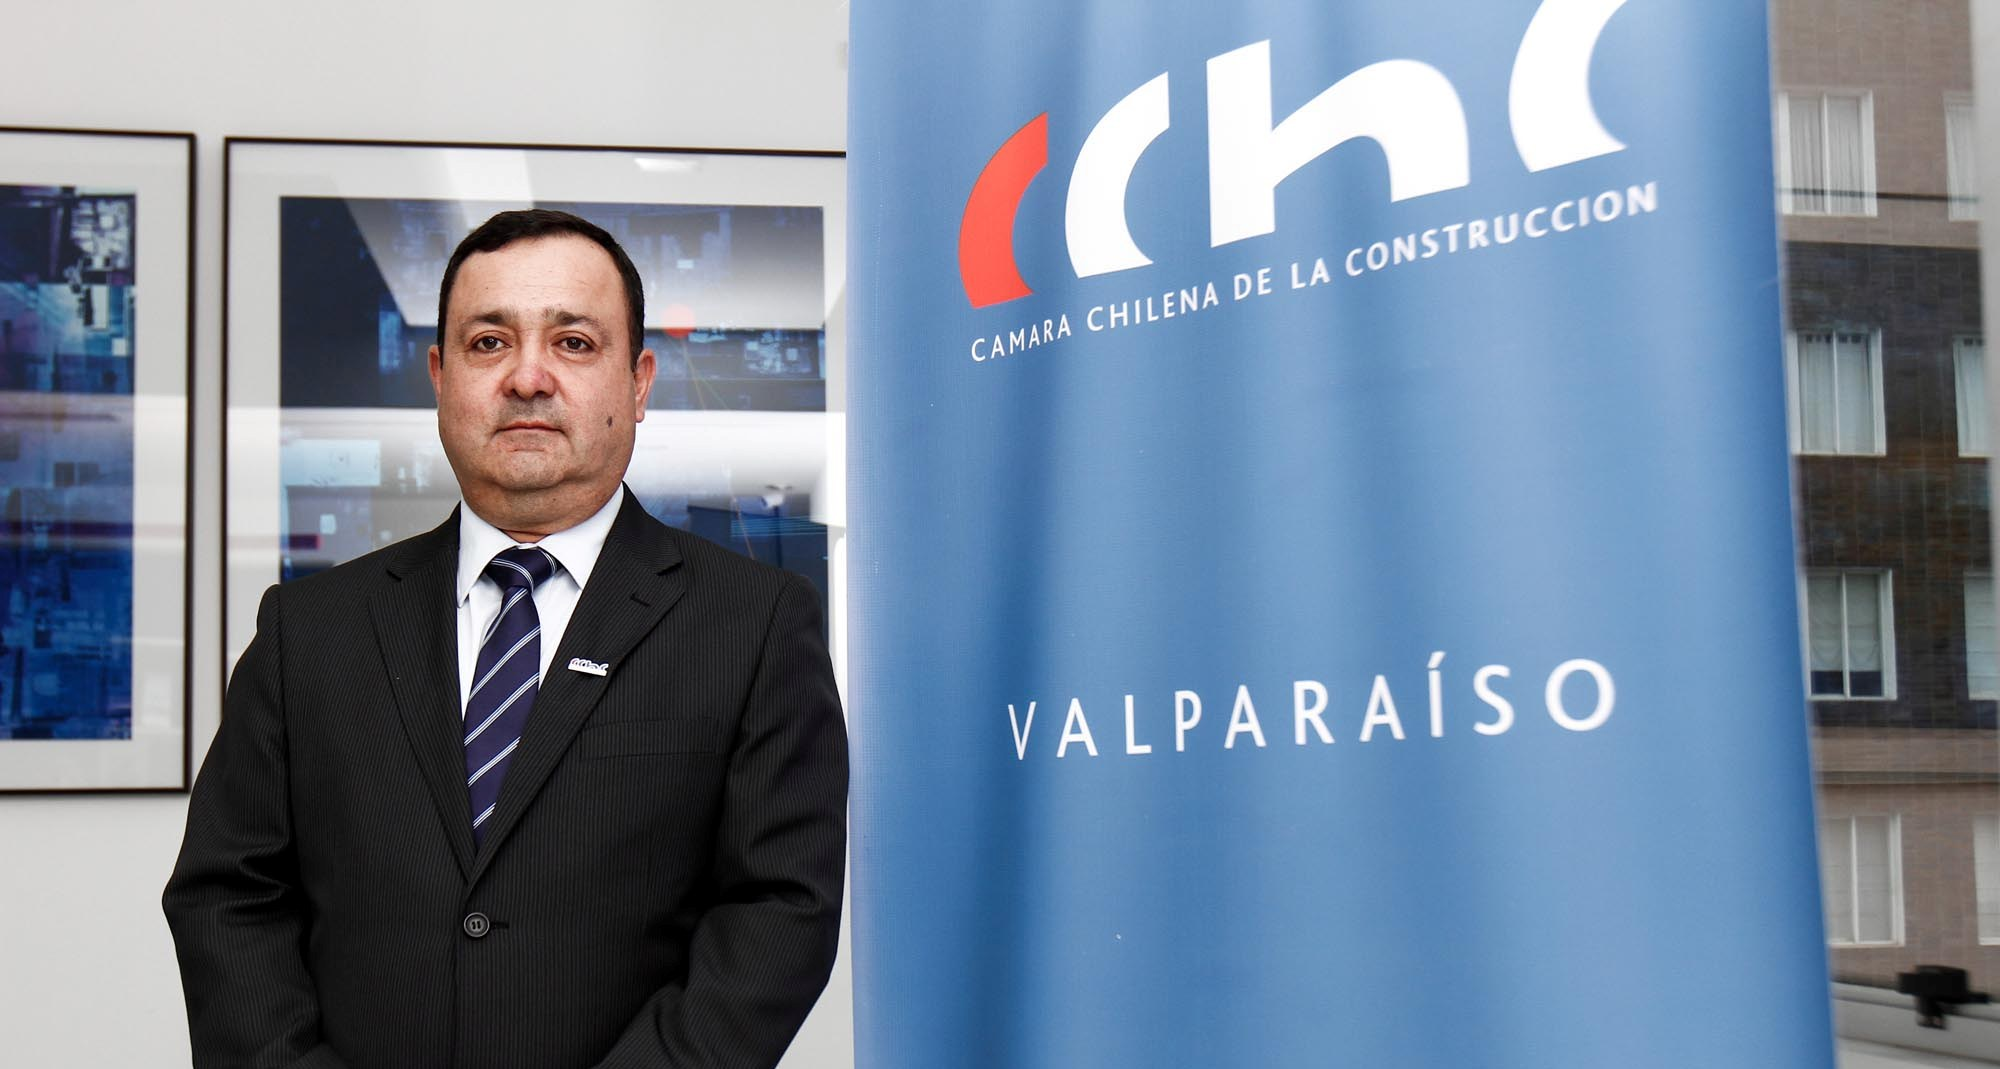 Marcelo_Pardo_Pdrte._CChC_Valpara%C3%ADso_web_cchc_encabezado.jpg